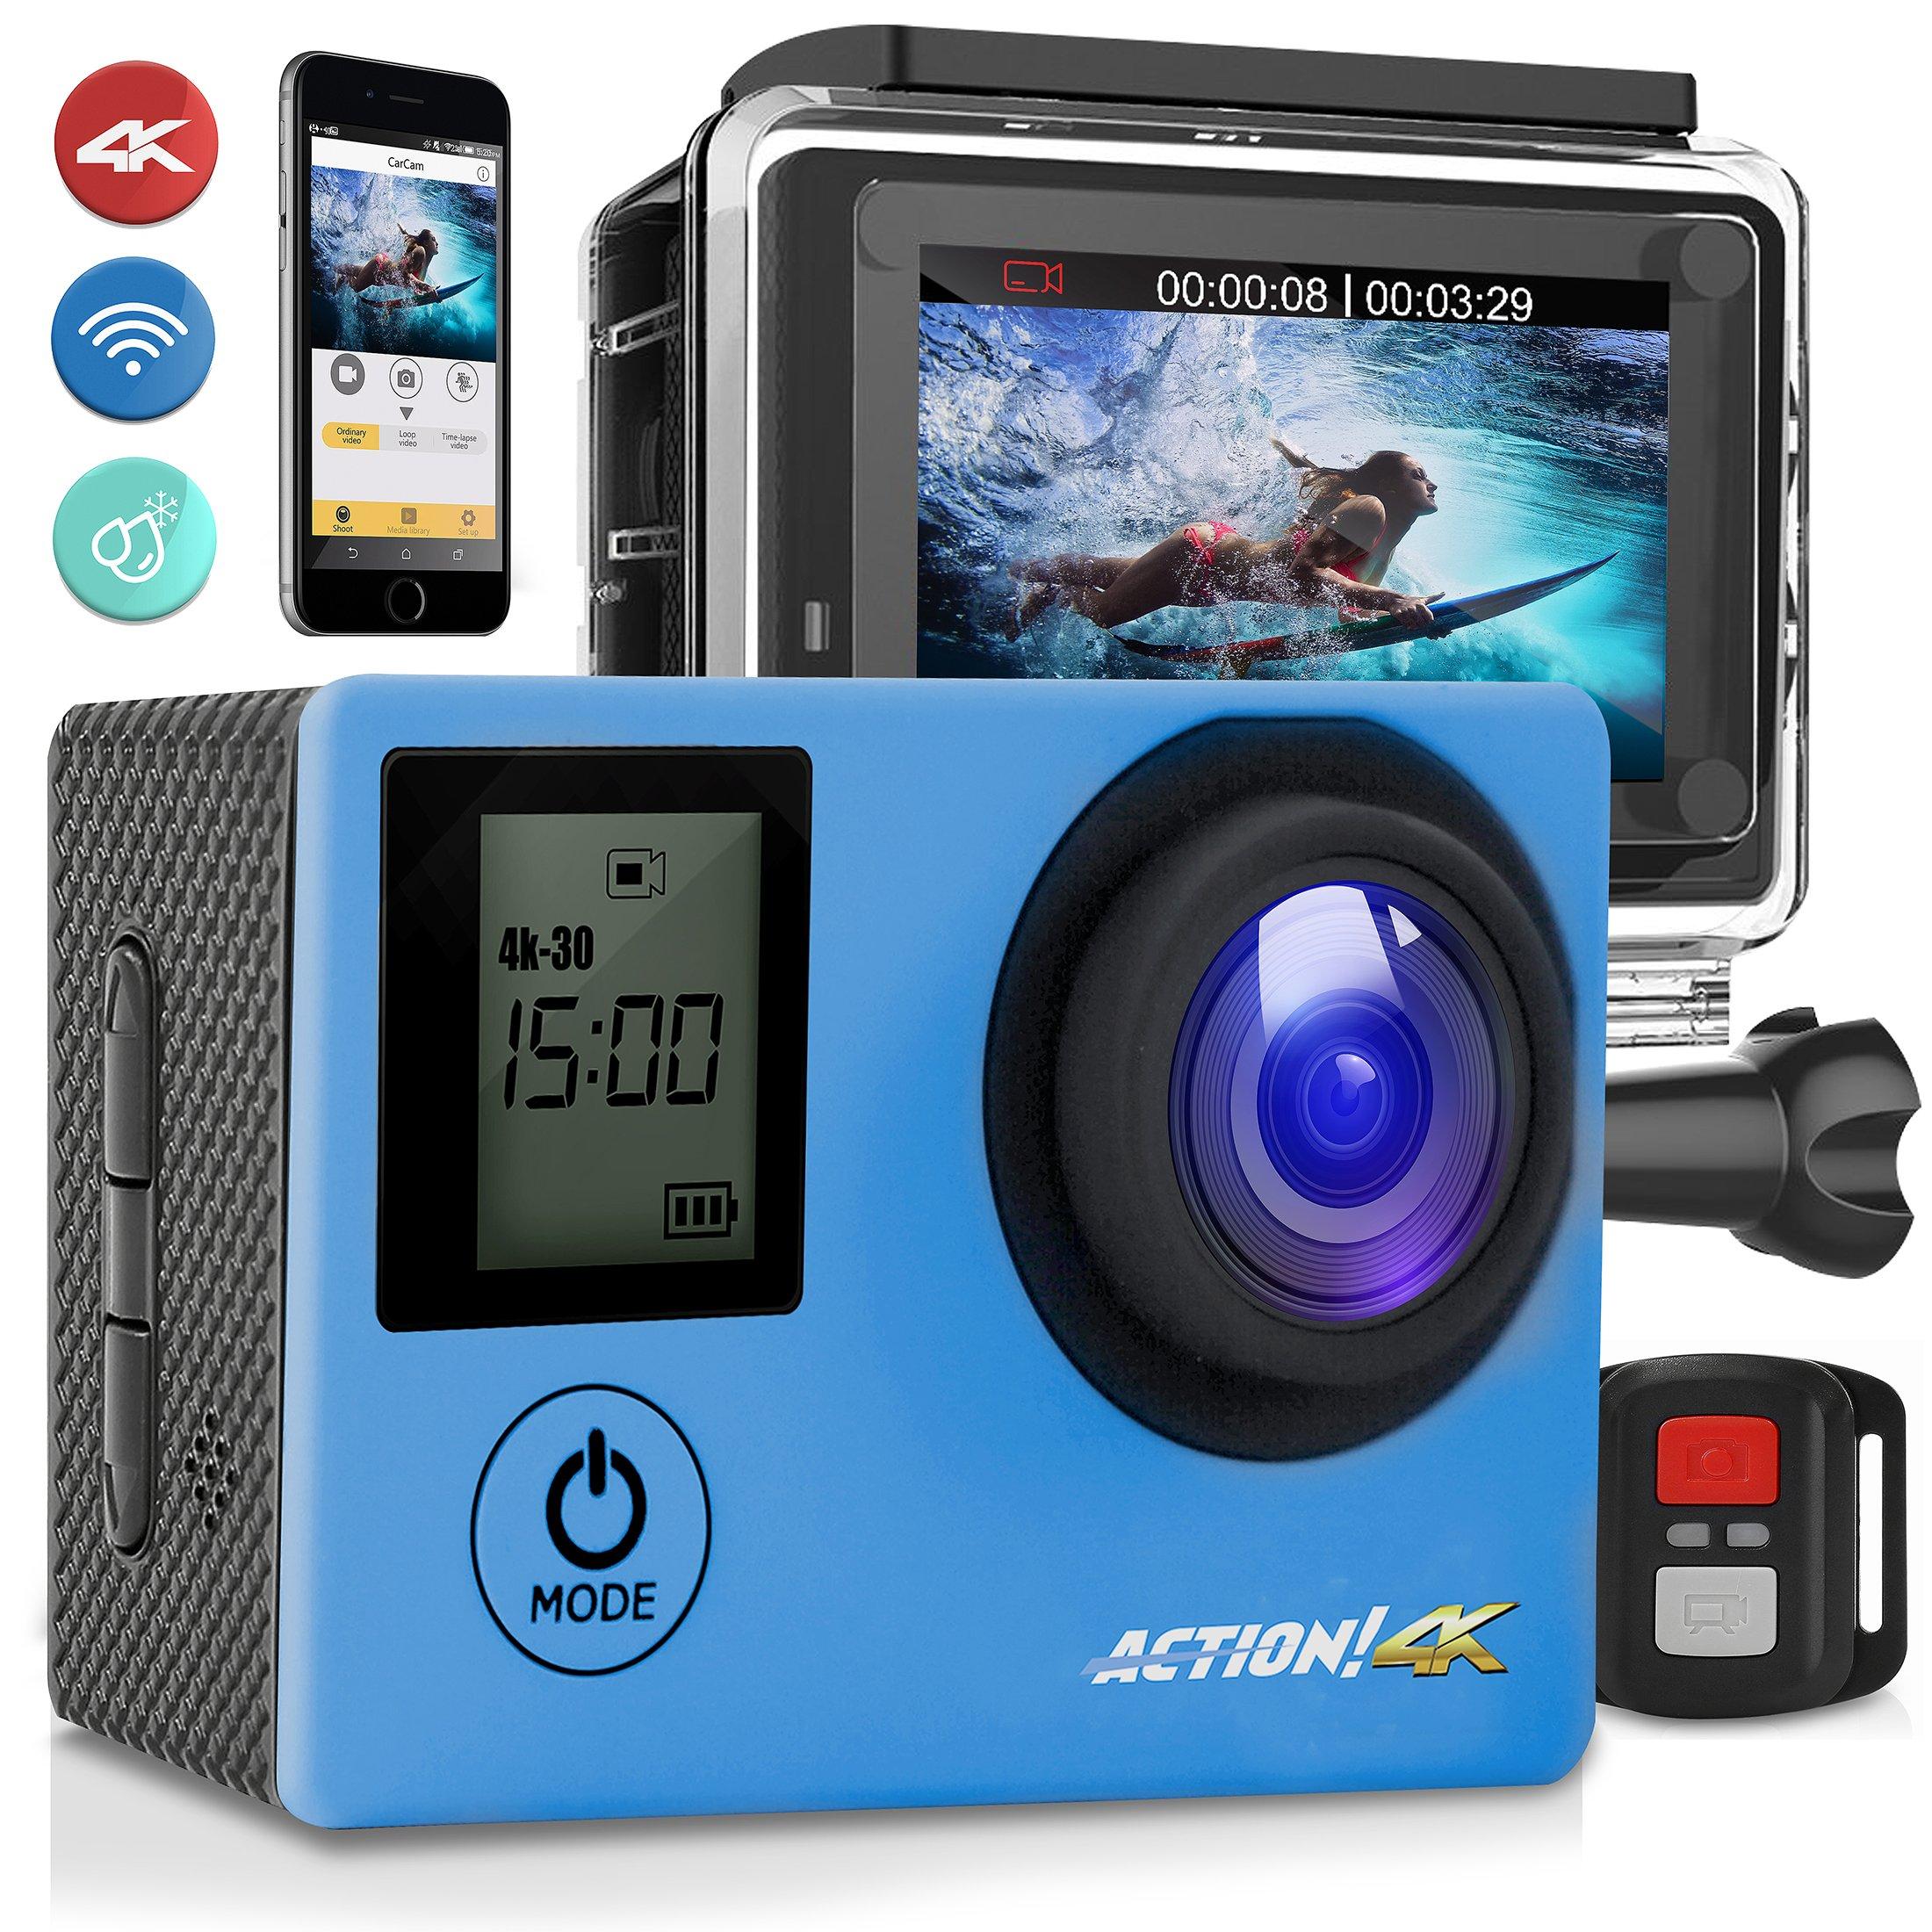 SereneLife 4K Ultra HD WiFi Pro Sport Action Camera - 1080p UHD Sports Mini Digital Video Camcorder Kit w/ 2'' Monitor Screen - Waterproof Case, Strap, Helmet Mount Accessories Included - SL4KDSBL